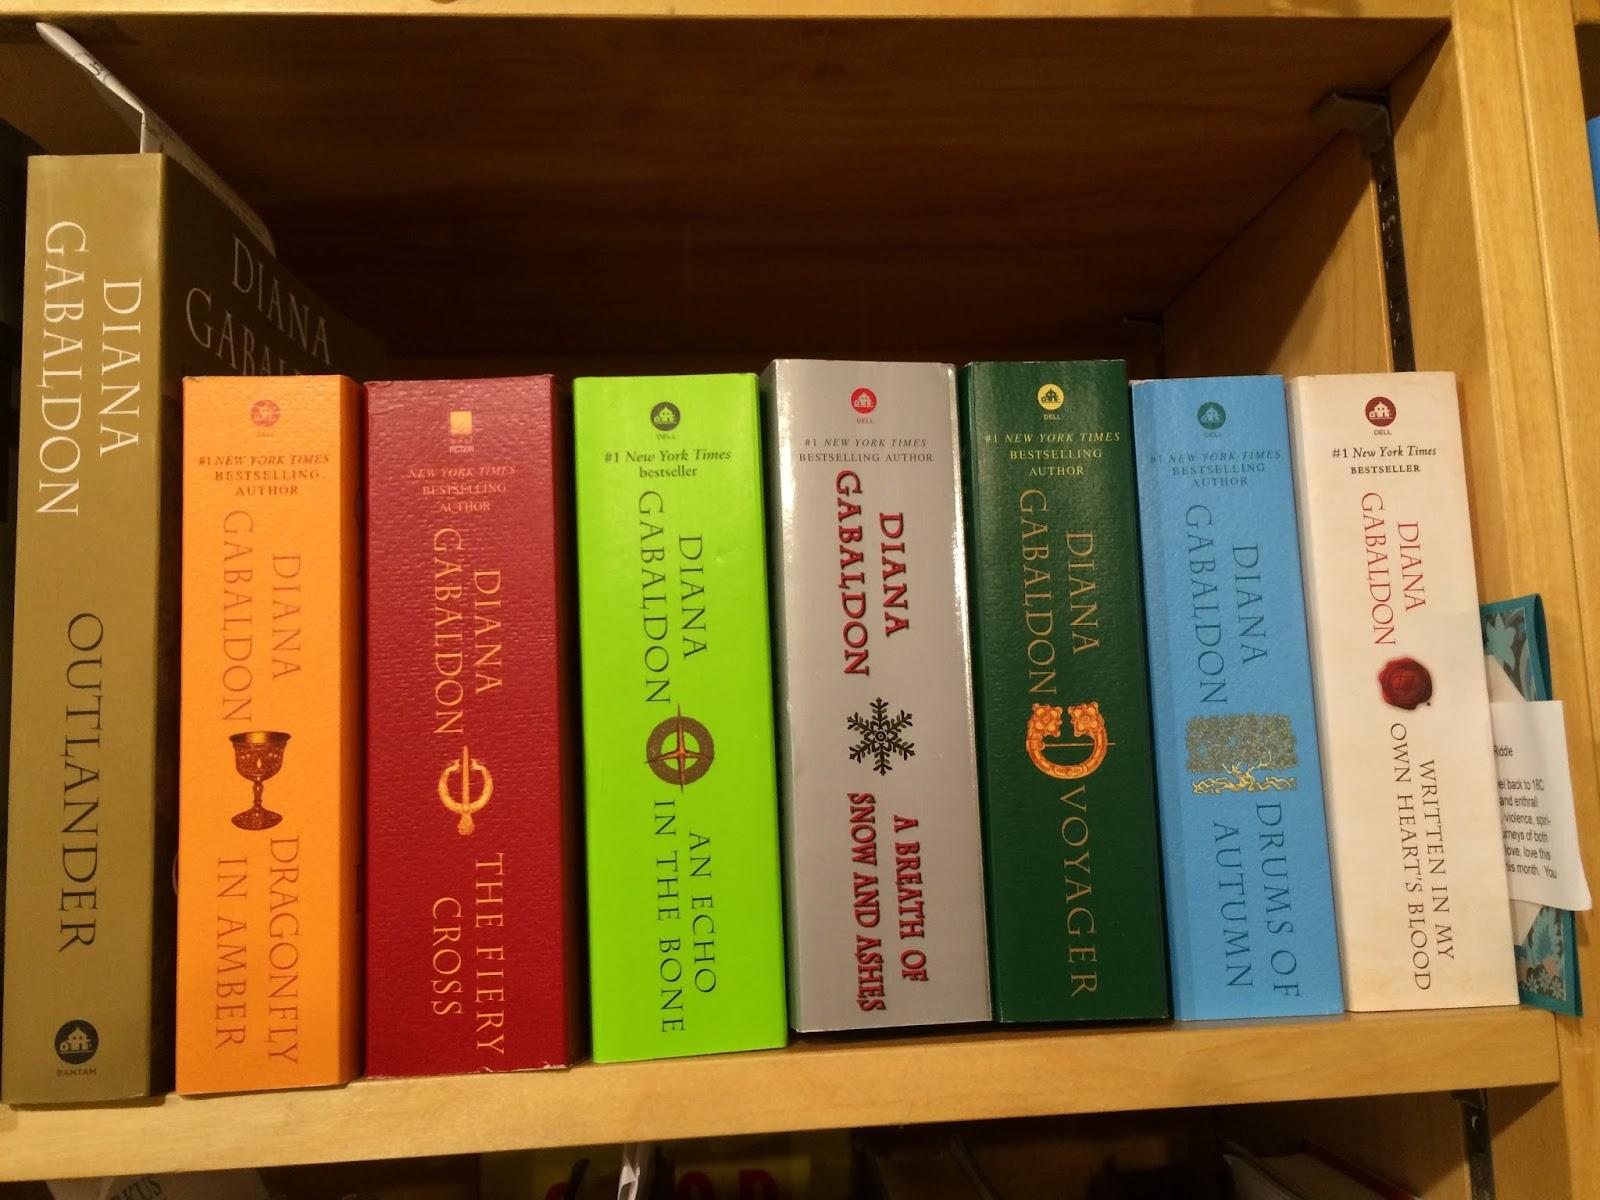 Diana Gabaldon Lovers Will Find All The Outlander Books